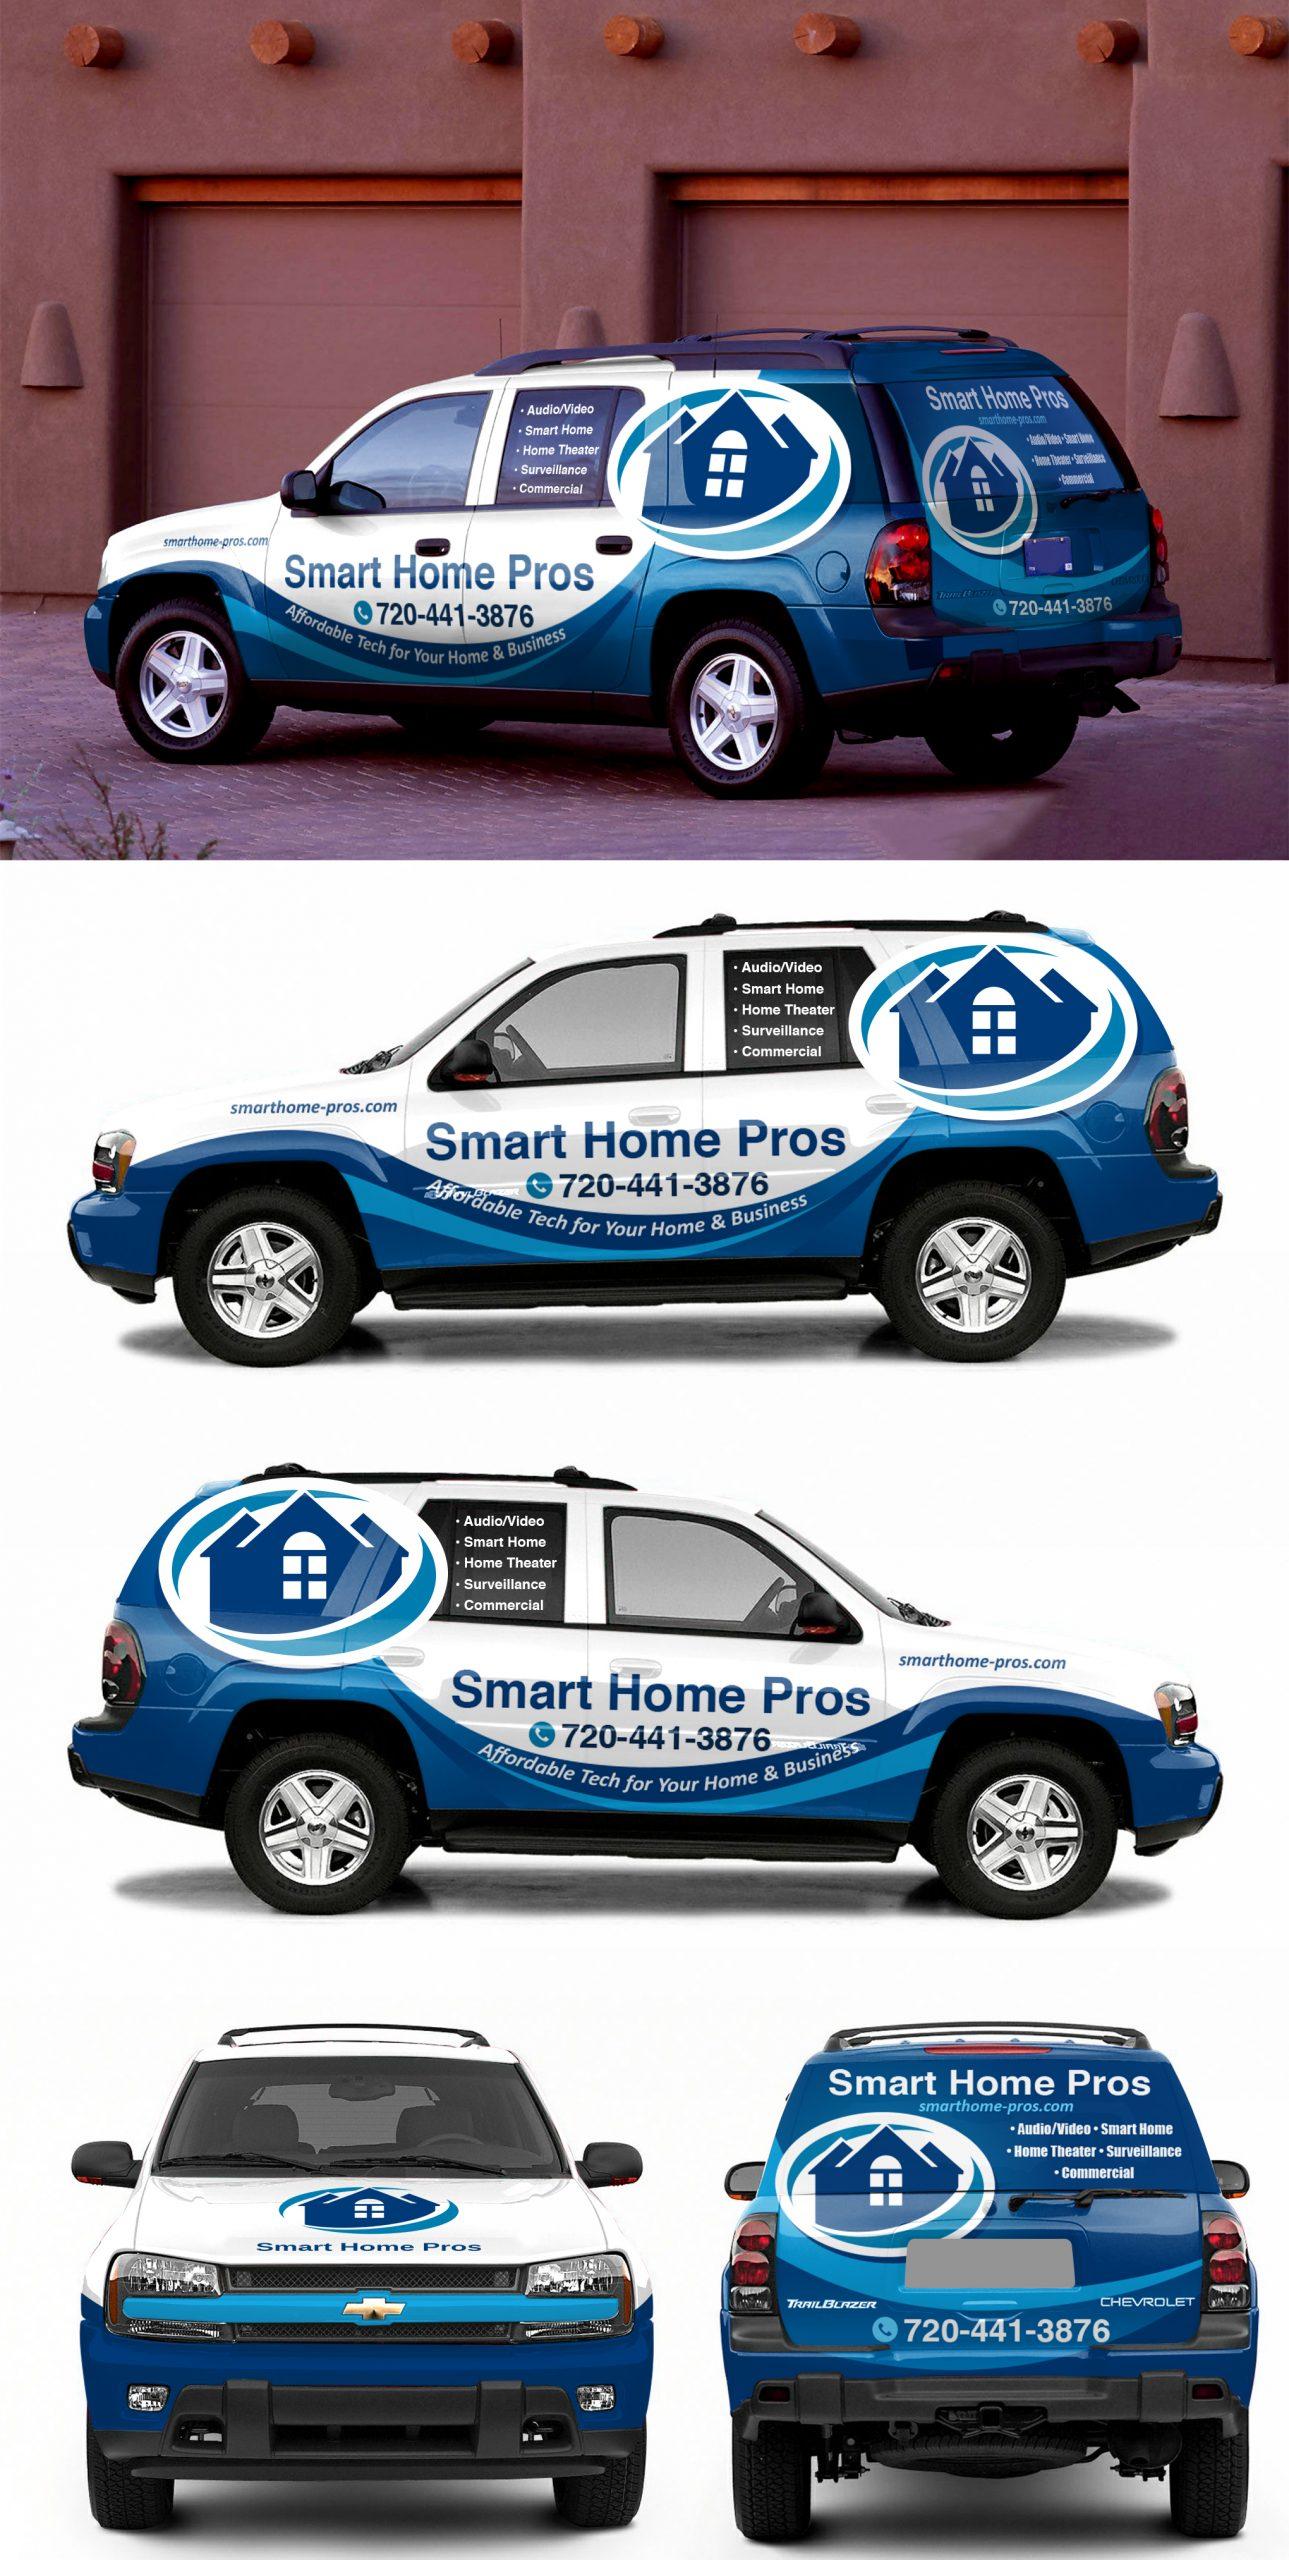 Smart Home Pros SUV mockup